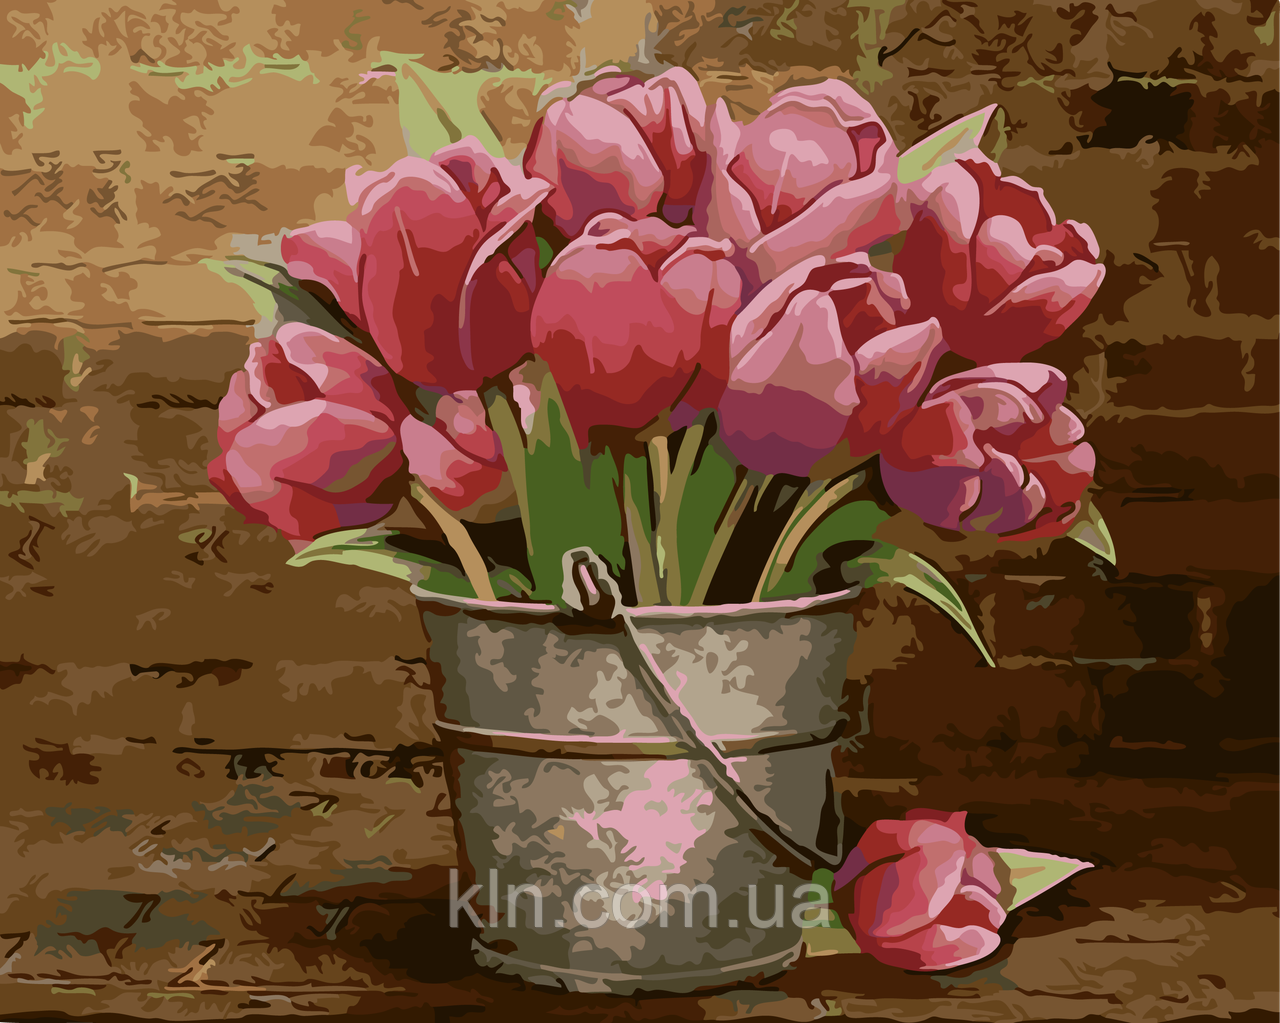 Картина по номерам ArtStory Тюльпаны 40 х 50 см (арт. AS0009)